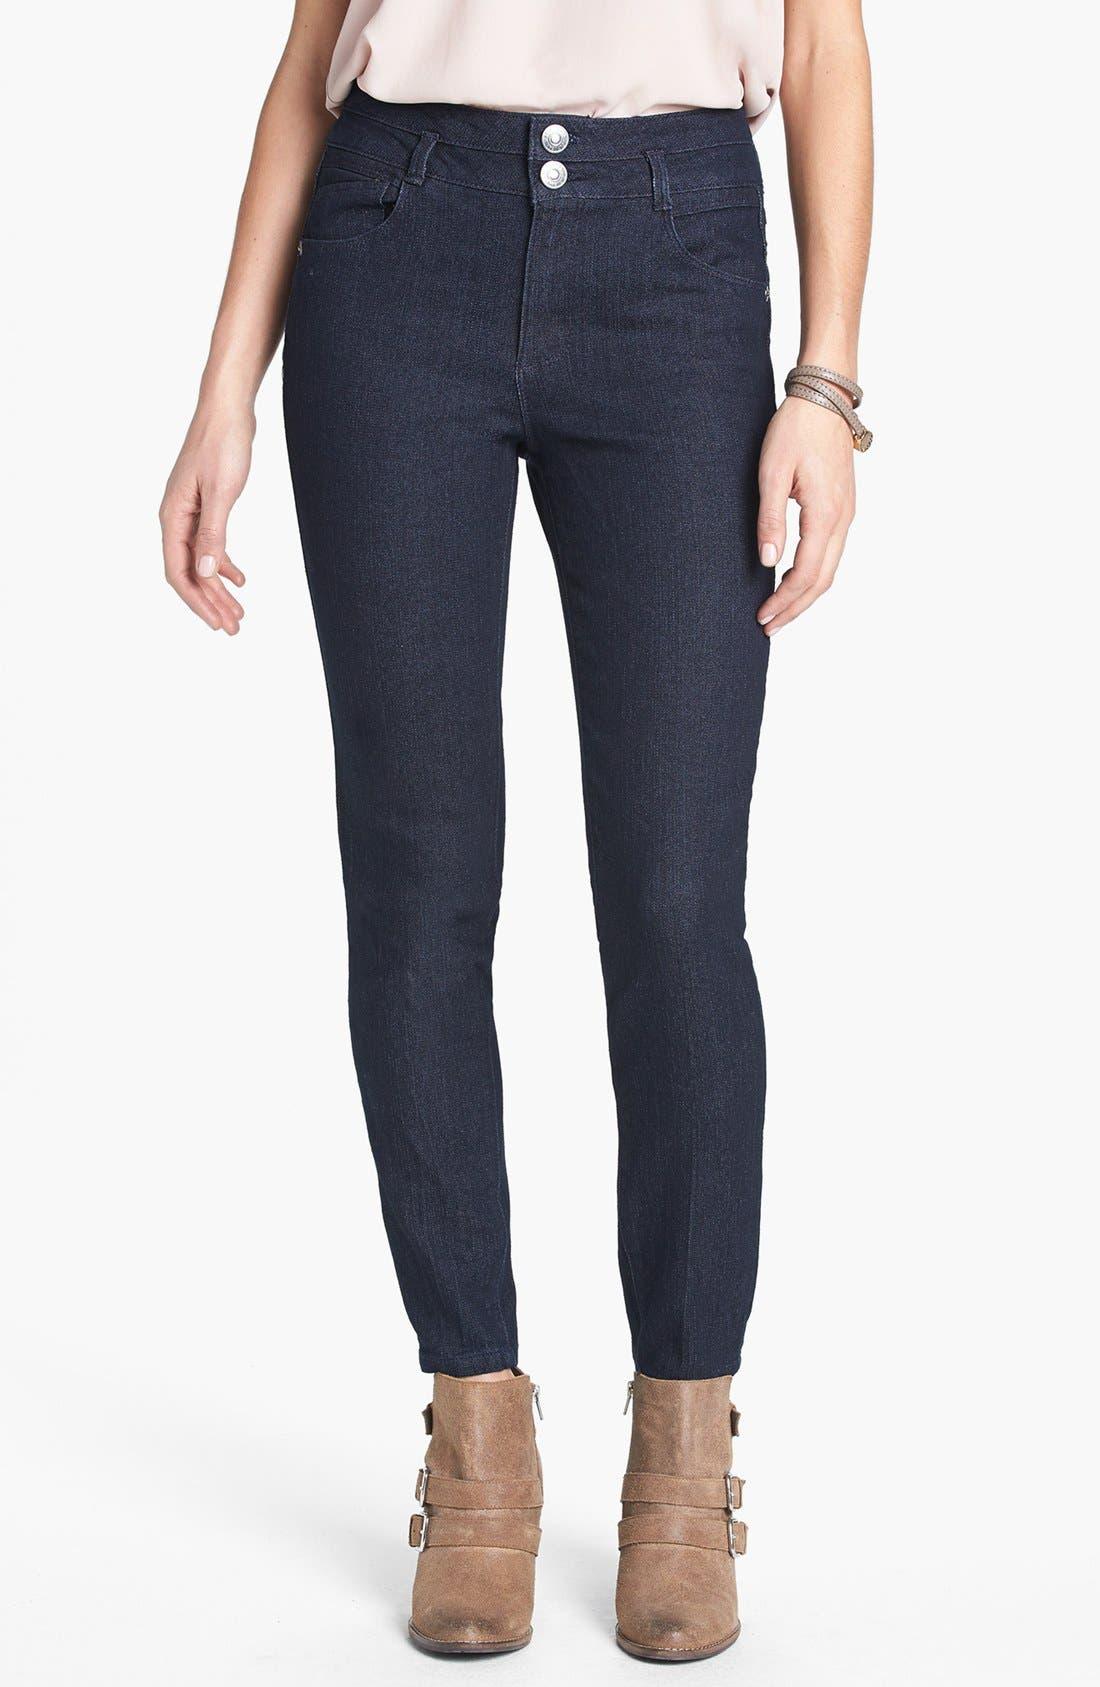 Alternate Image 1 Selected - Jolt High Waist Skinny Ankle Jeans (Juniors) (Online Only)